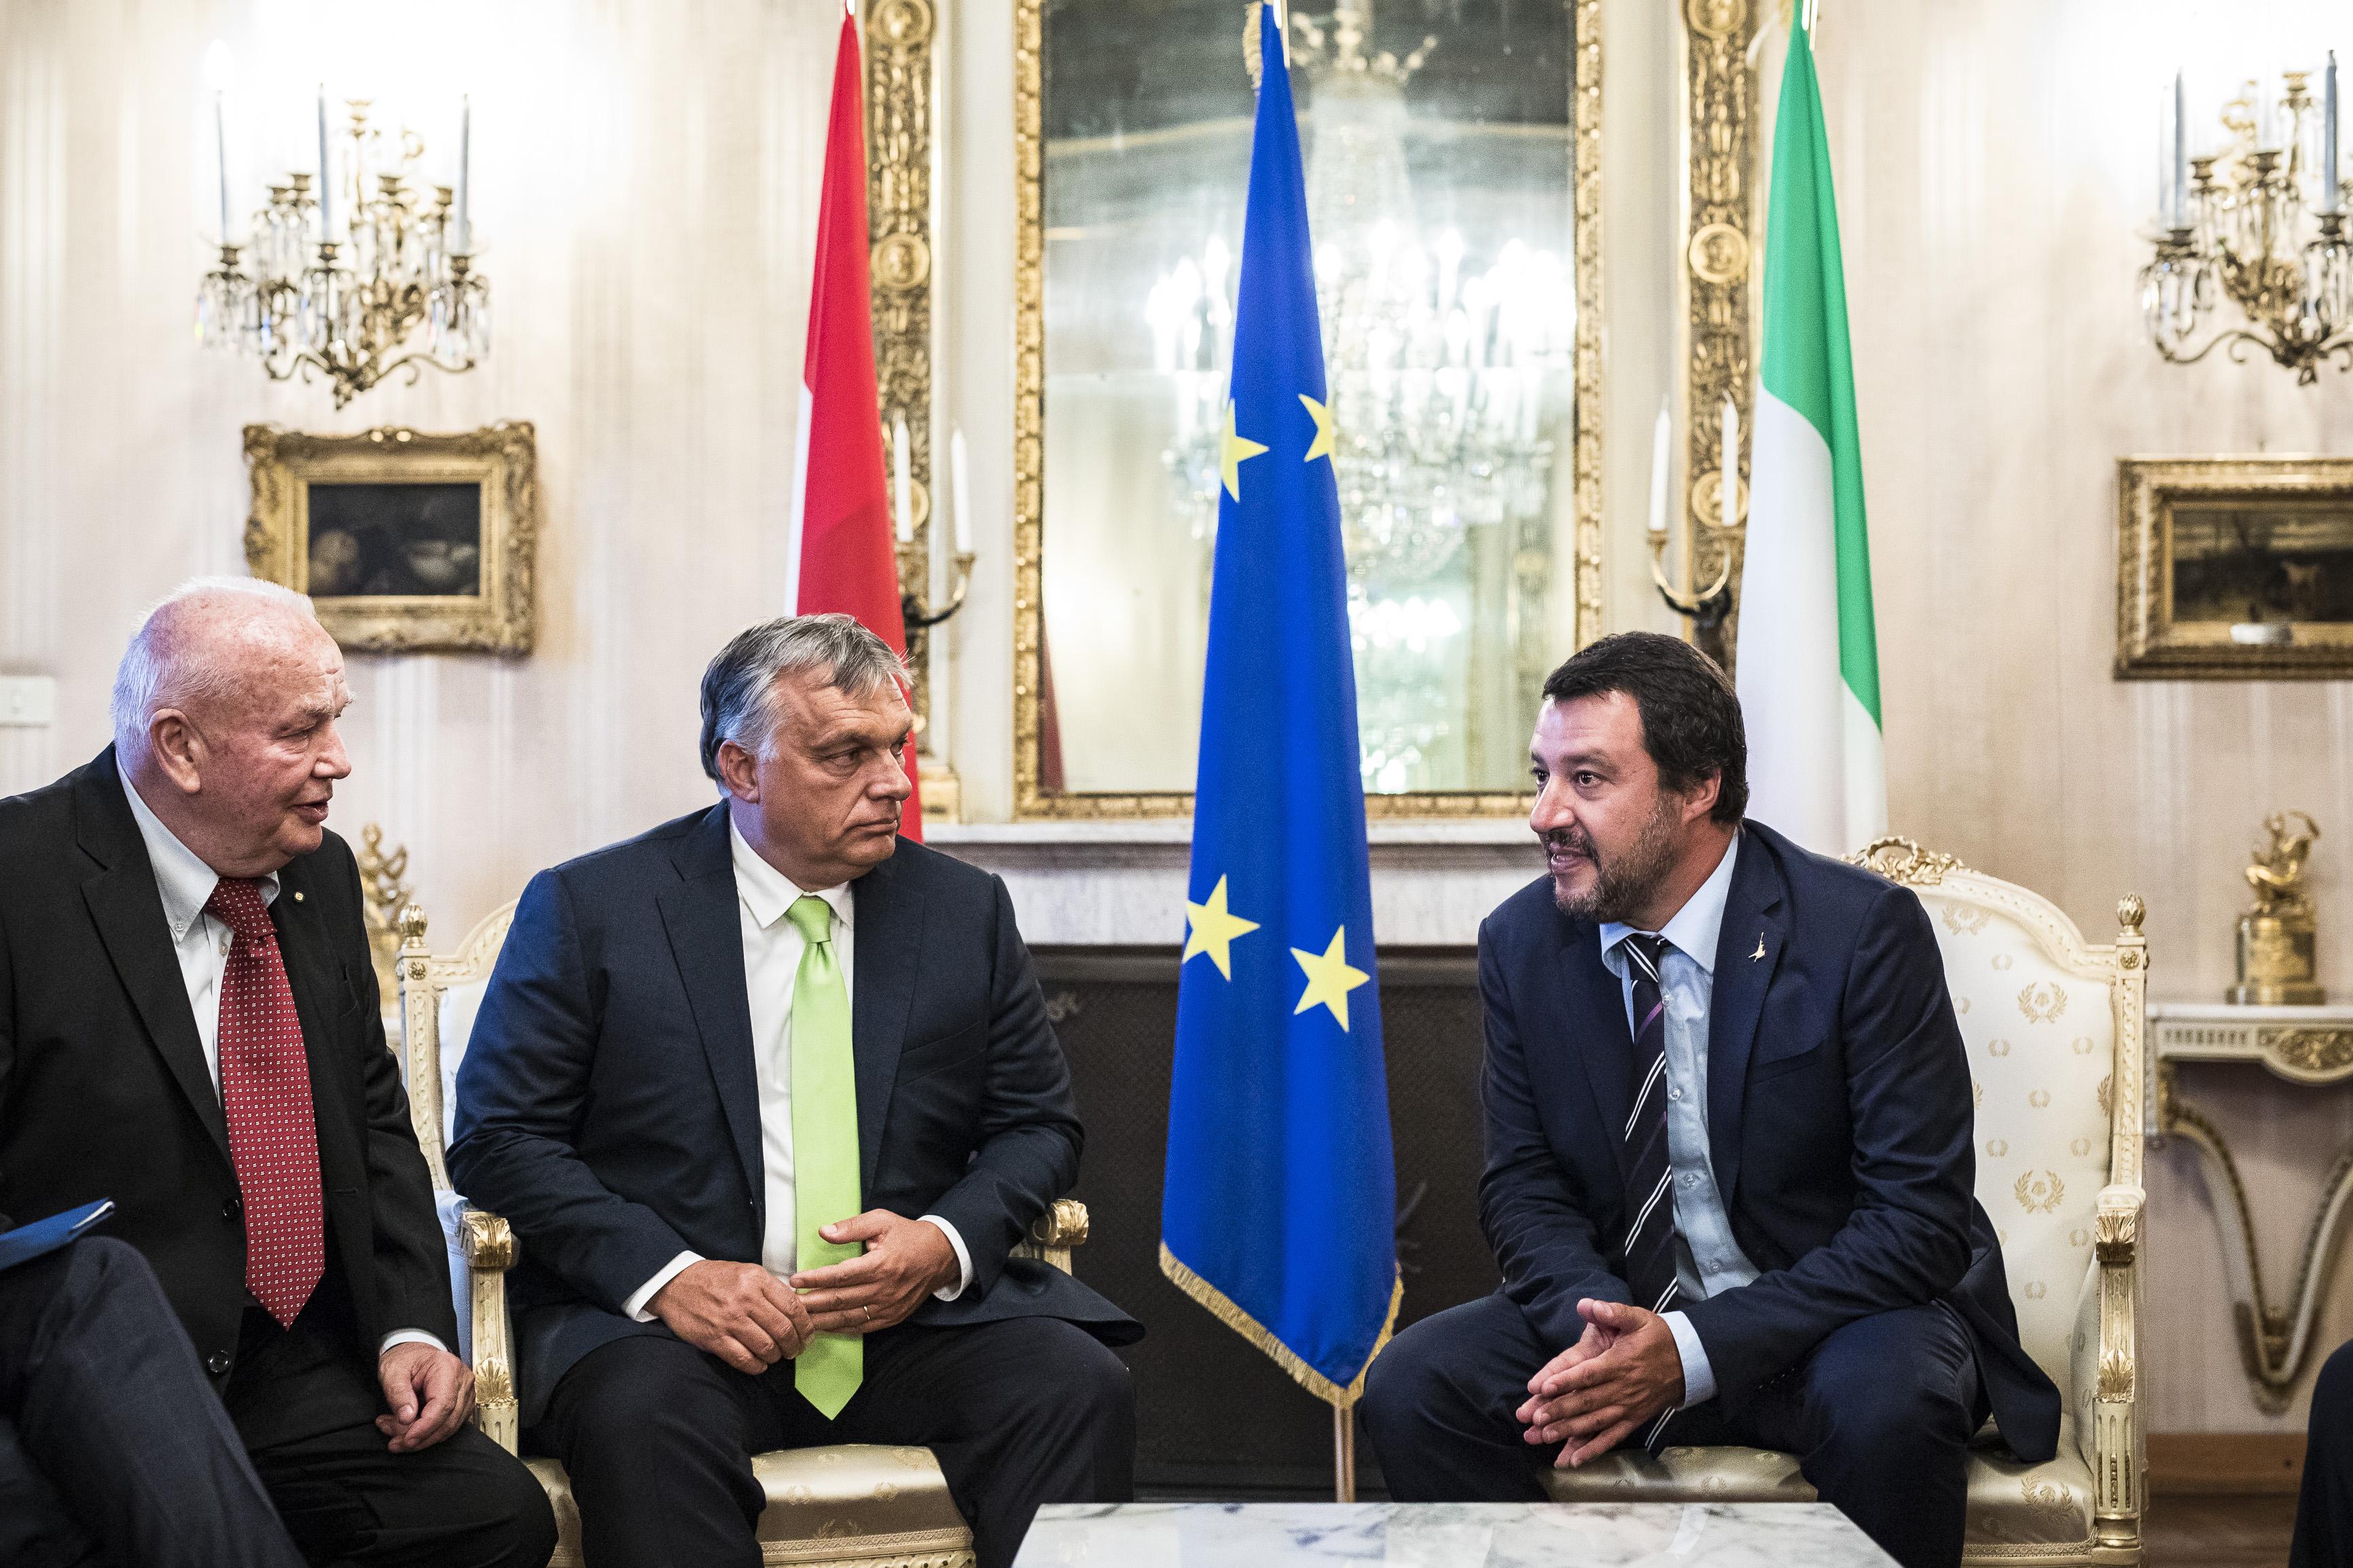 Premierul Viktor Orbán şi Ministrul de Interne al Italiei, Matteo Salvini. (foto www.kormany.hu)